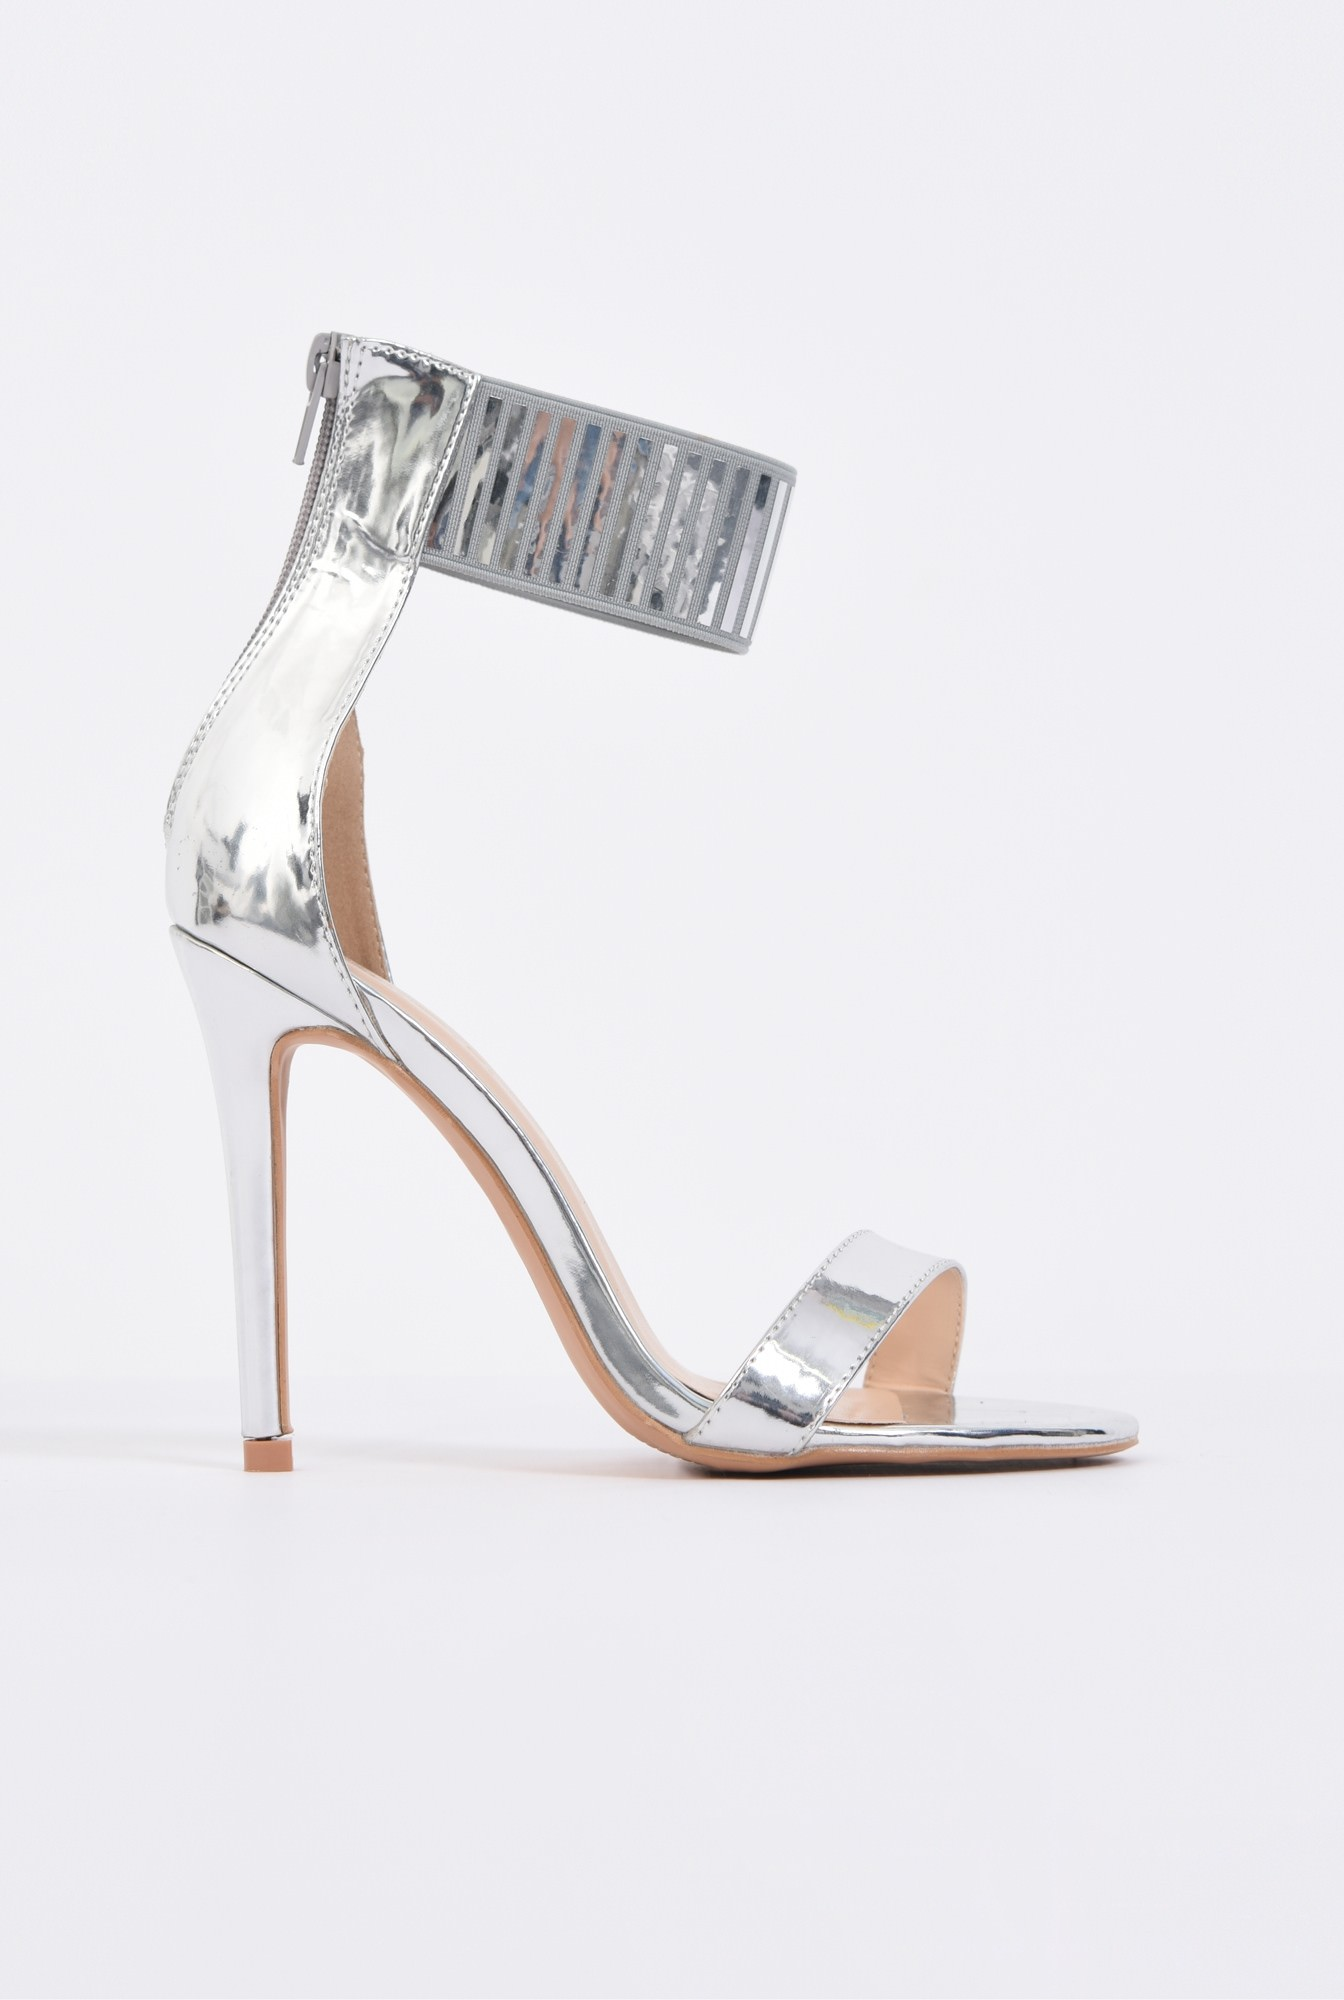 sandale elegante, argintii, metalizate, stiletto